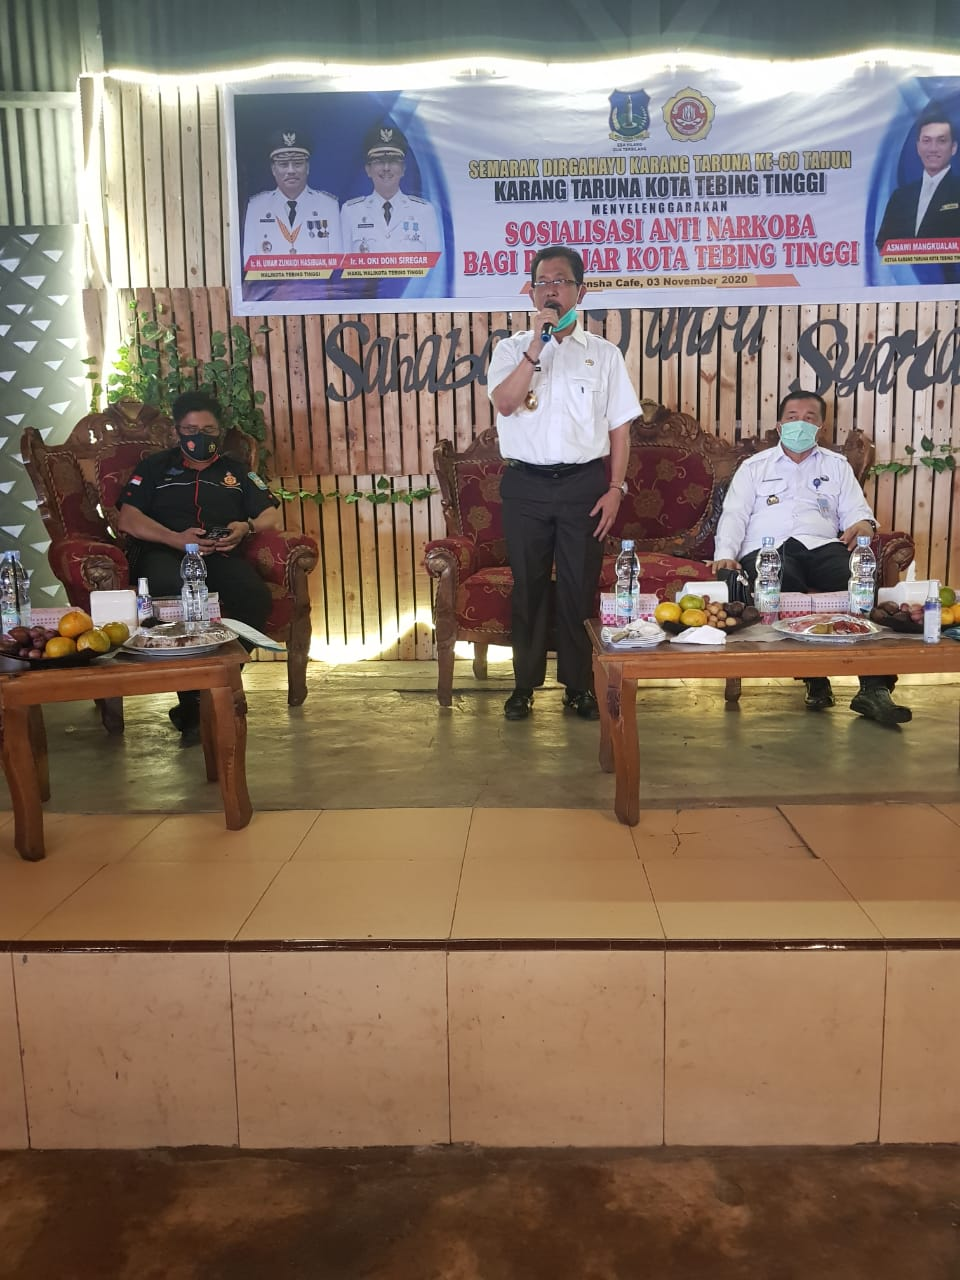 Buka Sosialisasi Anti Narkoba,Wakil Walikota Tebing Tenggi Apresiasi Karang Taruna